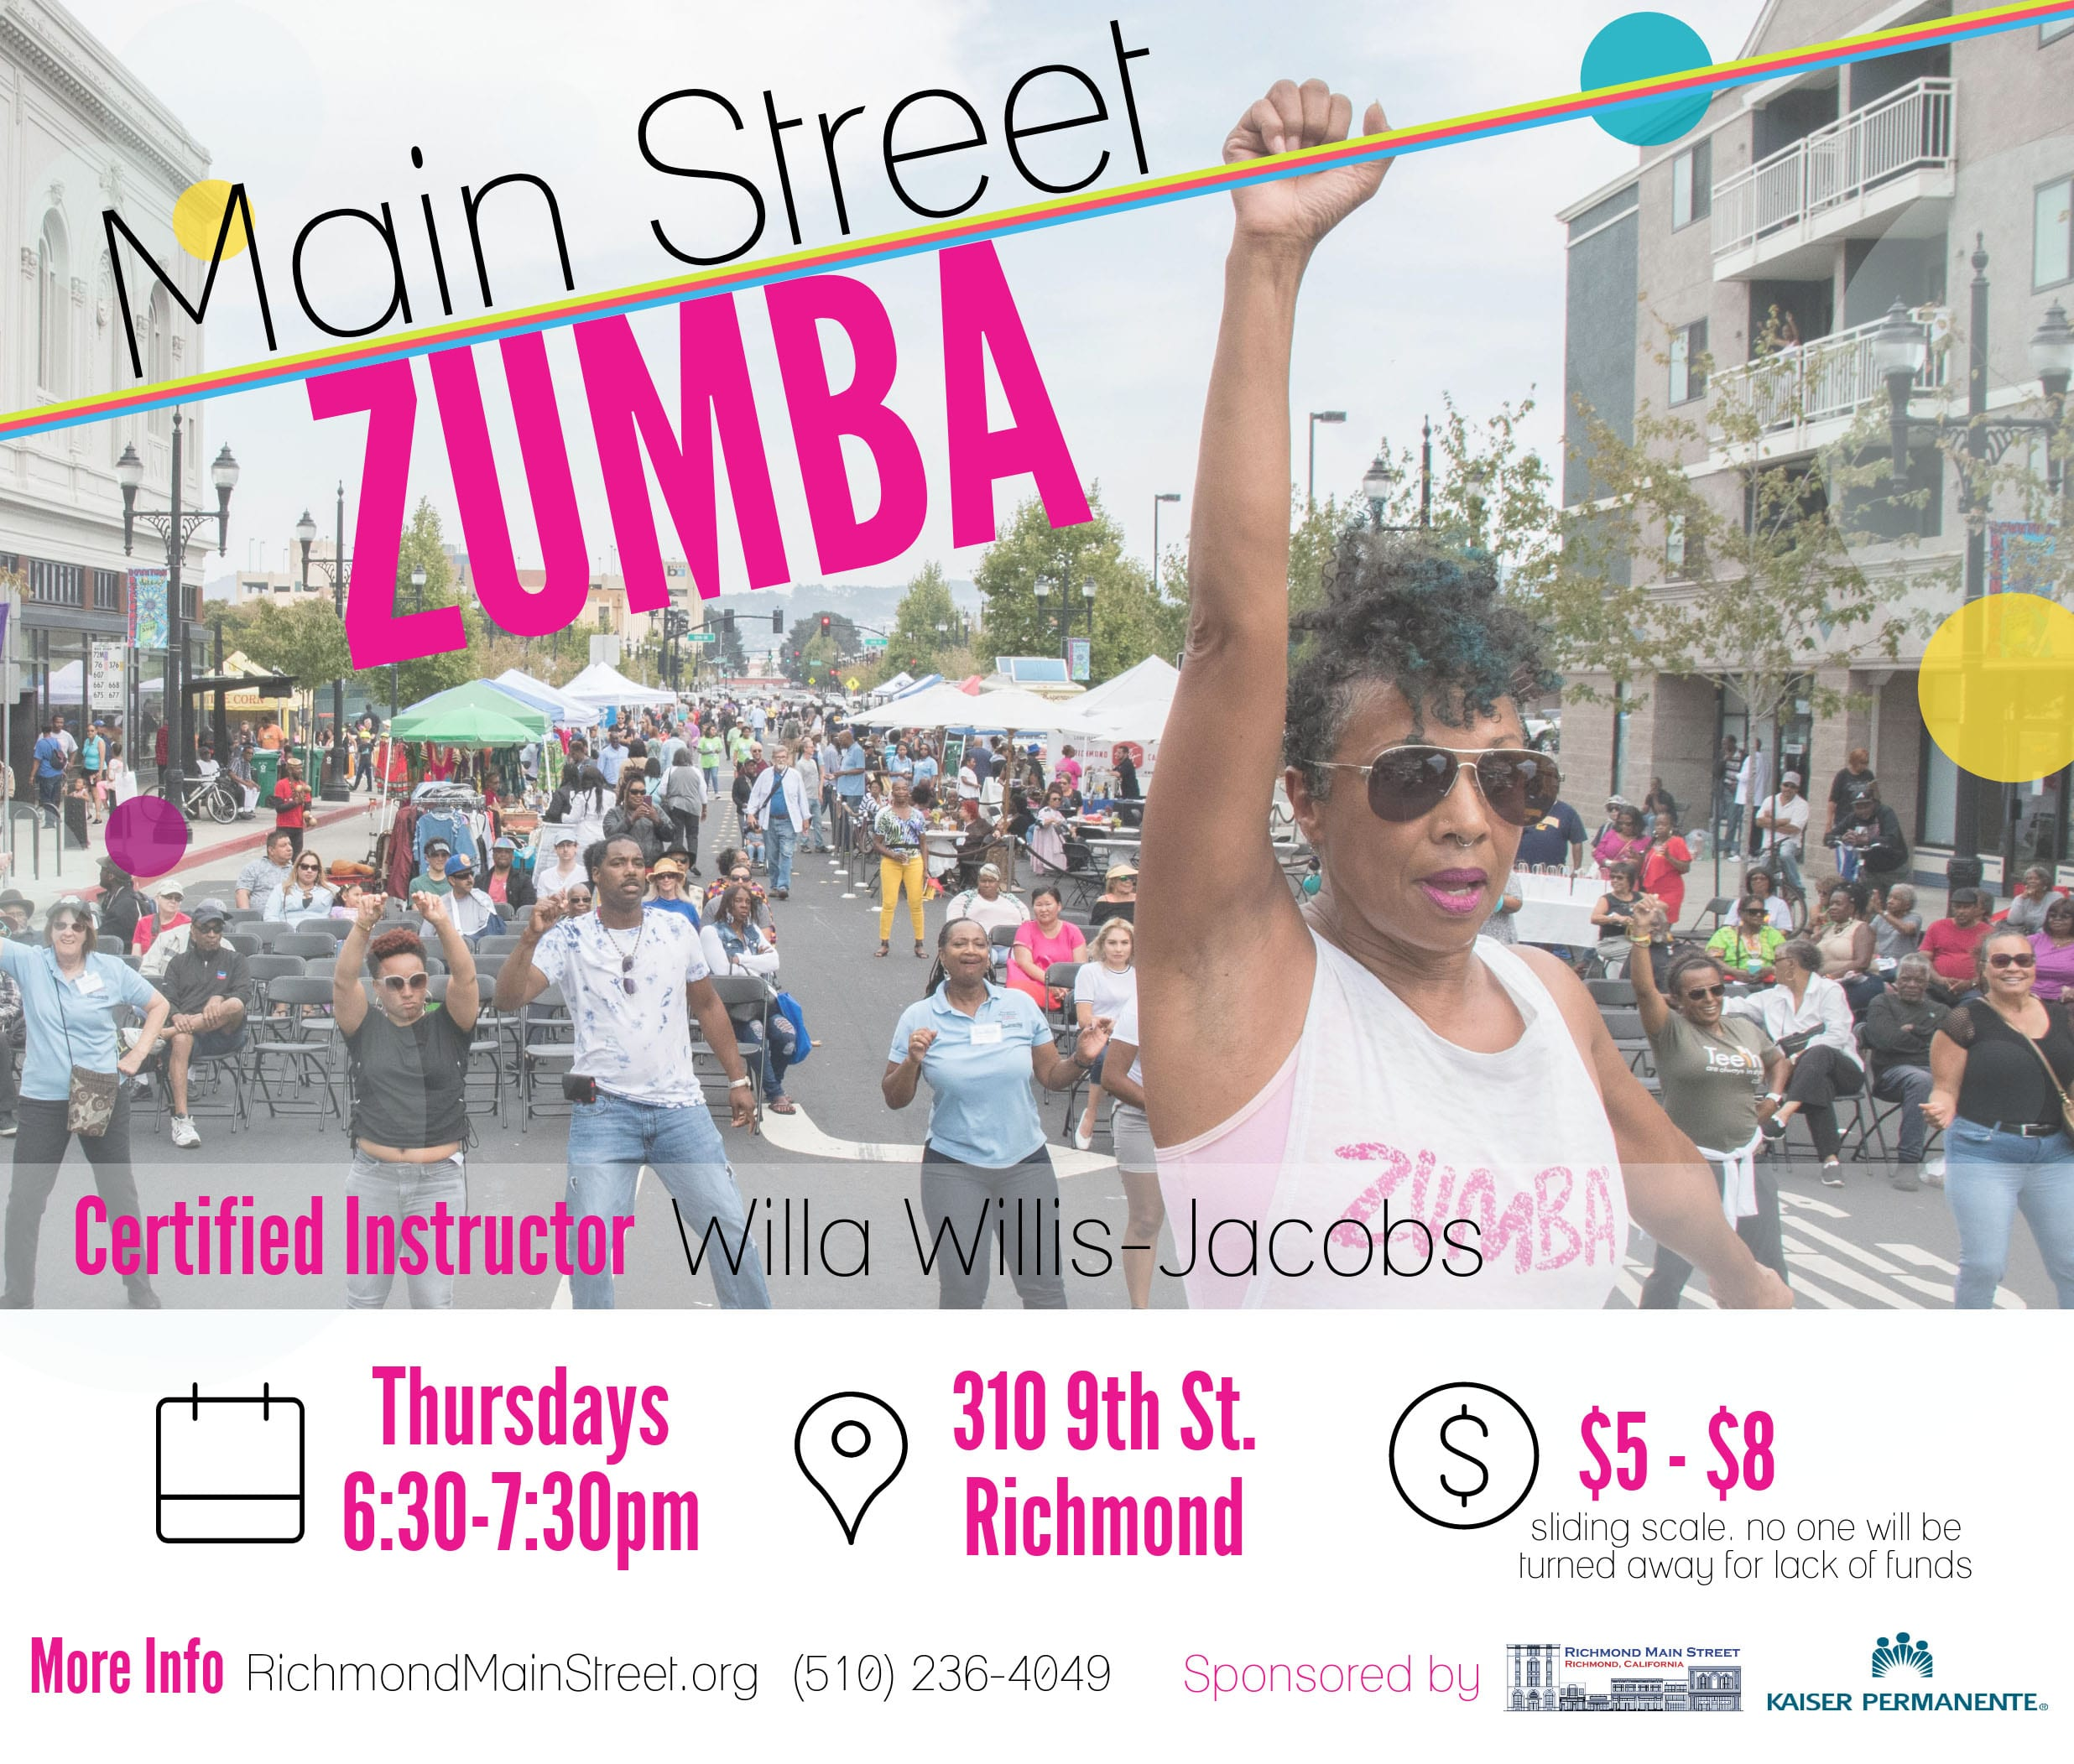 Main Street Zumba is BACK!